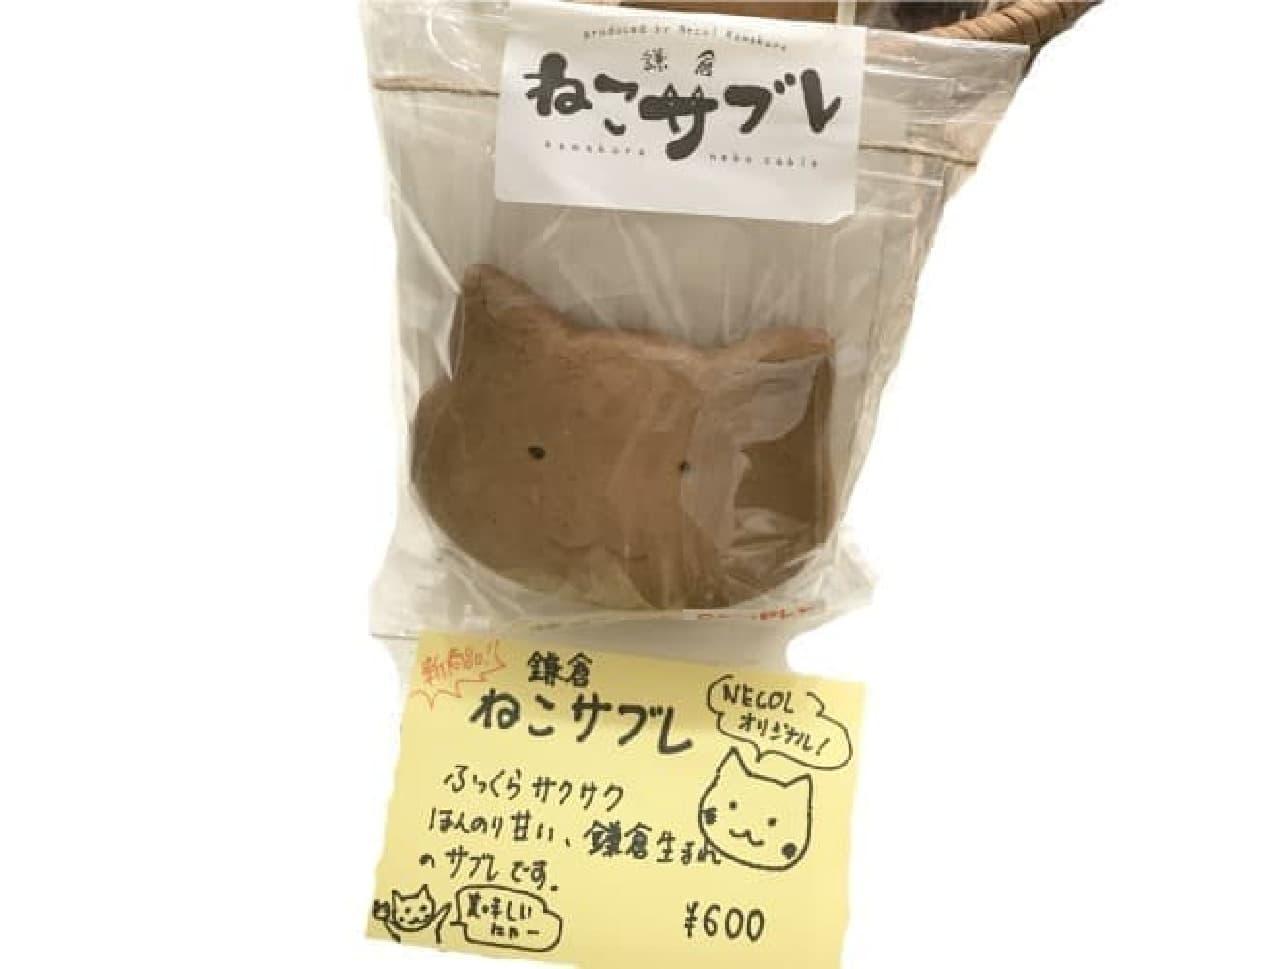 NECOL鎌倉「鎌倉ねこサブレ」